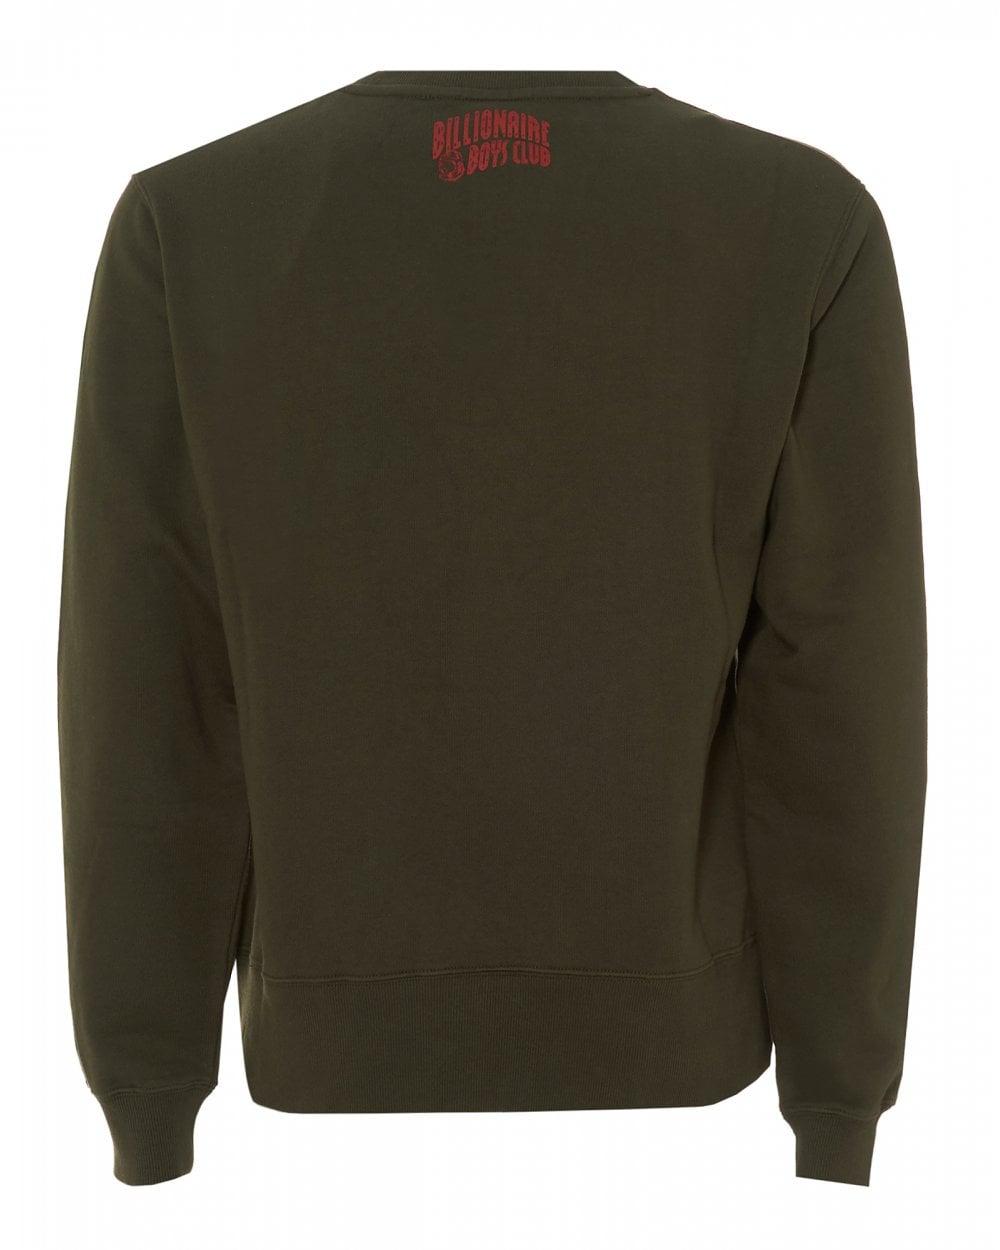 43a01acac Billionaire Boys Club Mens Pennant Applique Olive Green Sweatshirt